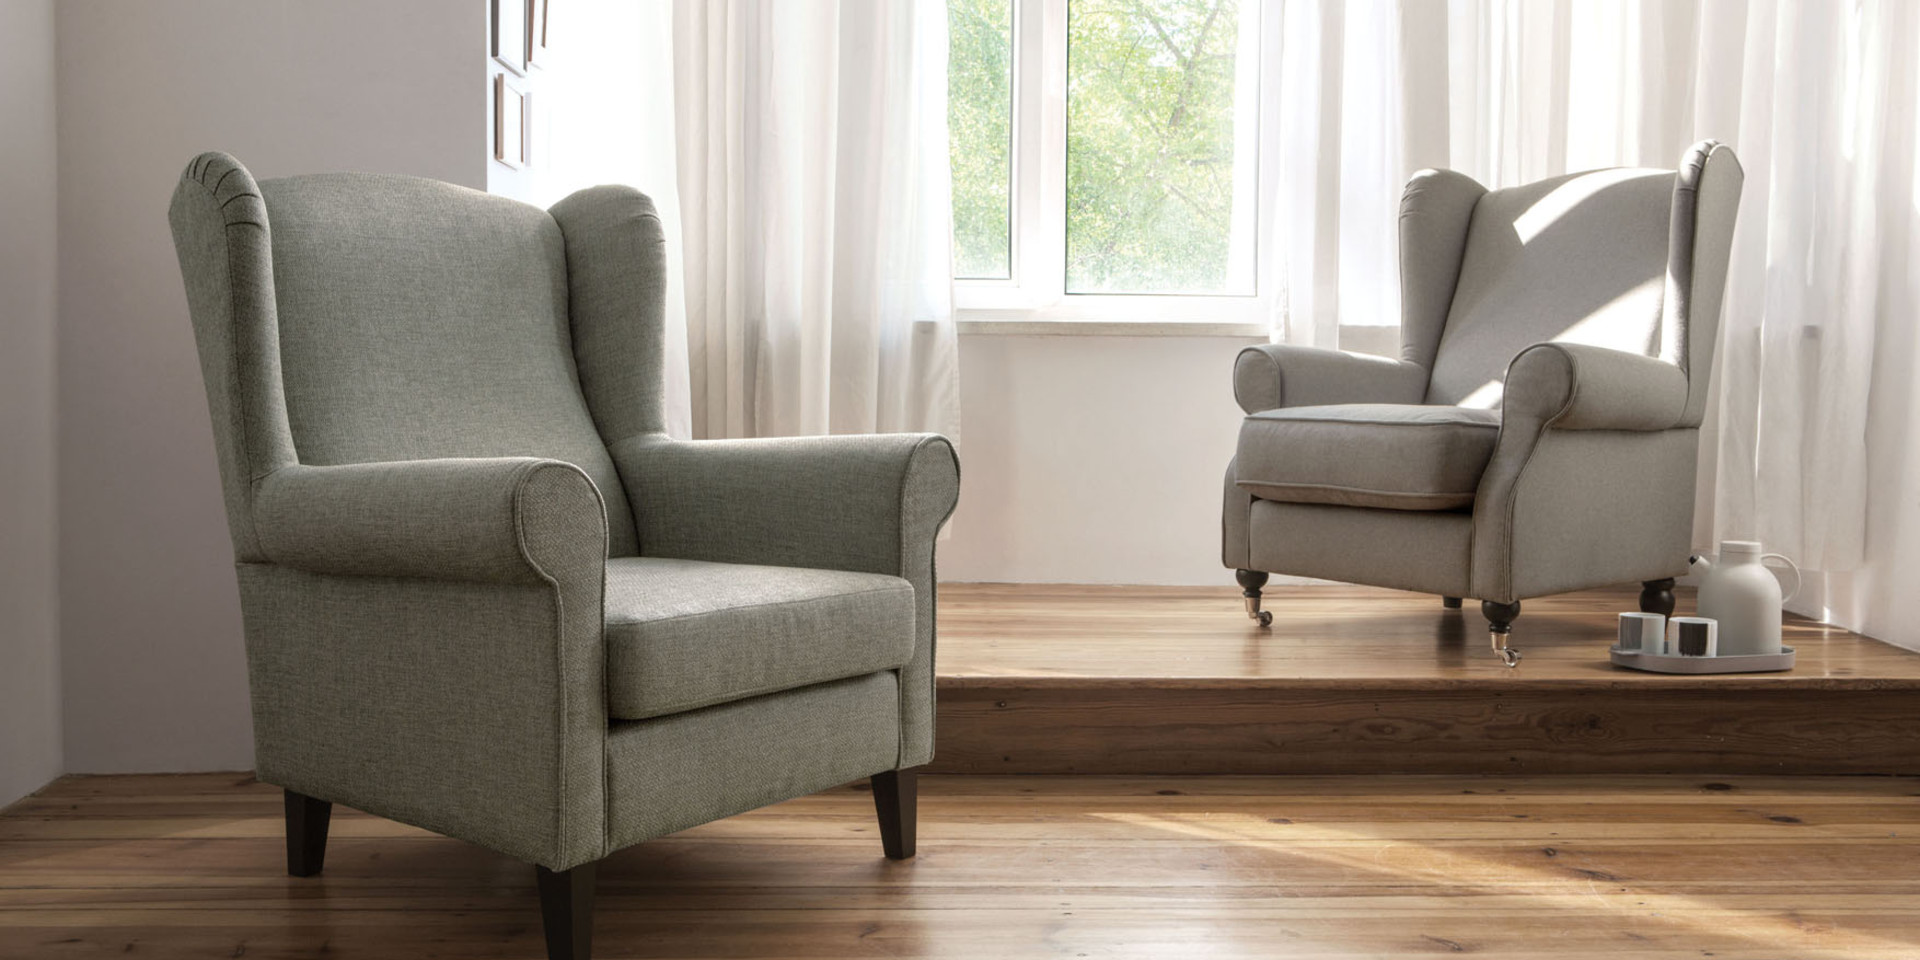 sits-watson-ambiance-armchair_high_panno1000_light_grey_watson_armchair_himalaya7_green_5